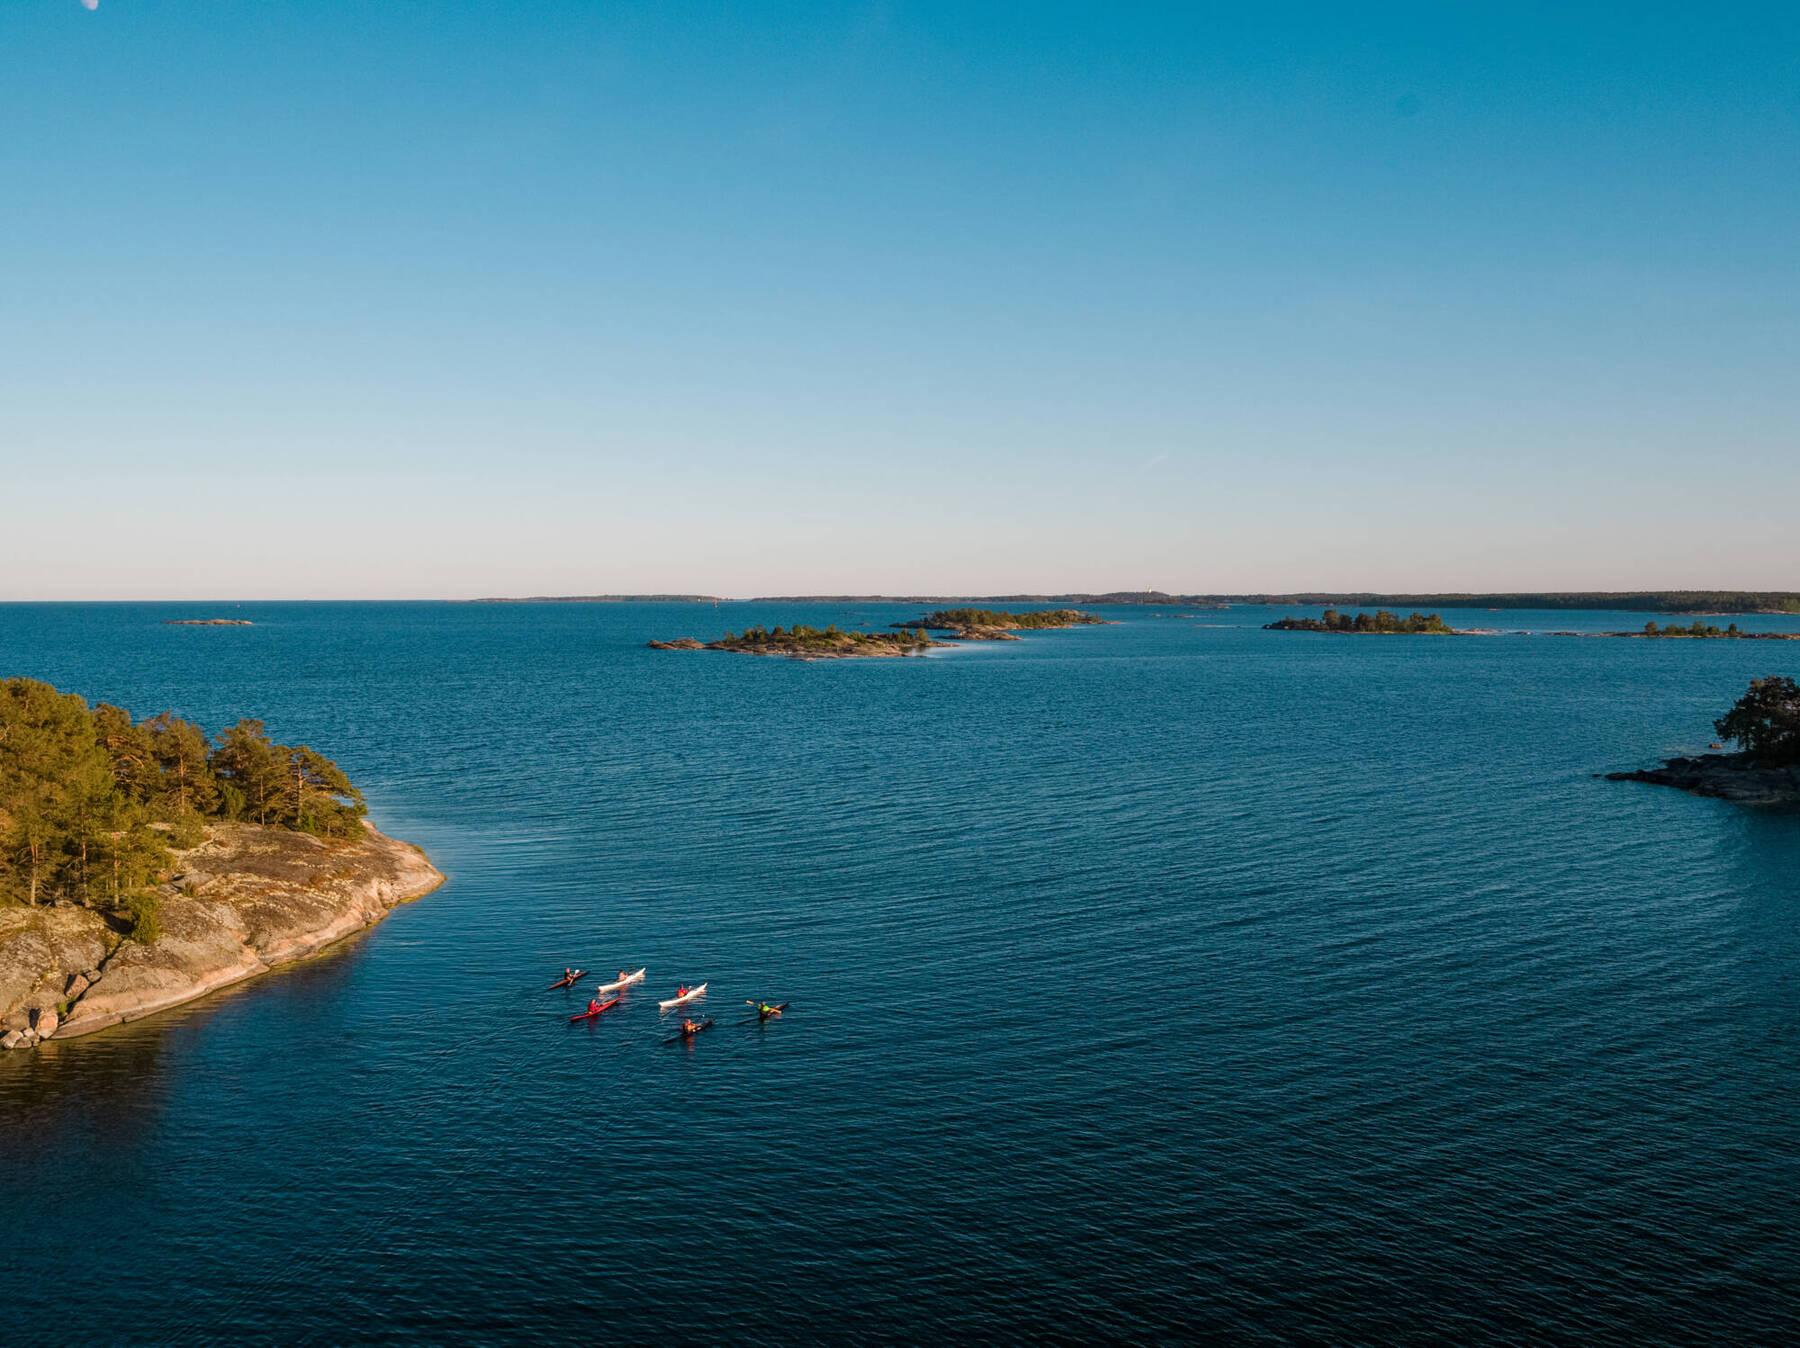 Kayaking among the islands in Västervik